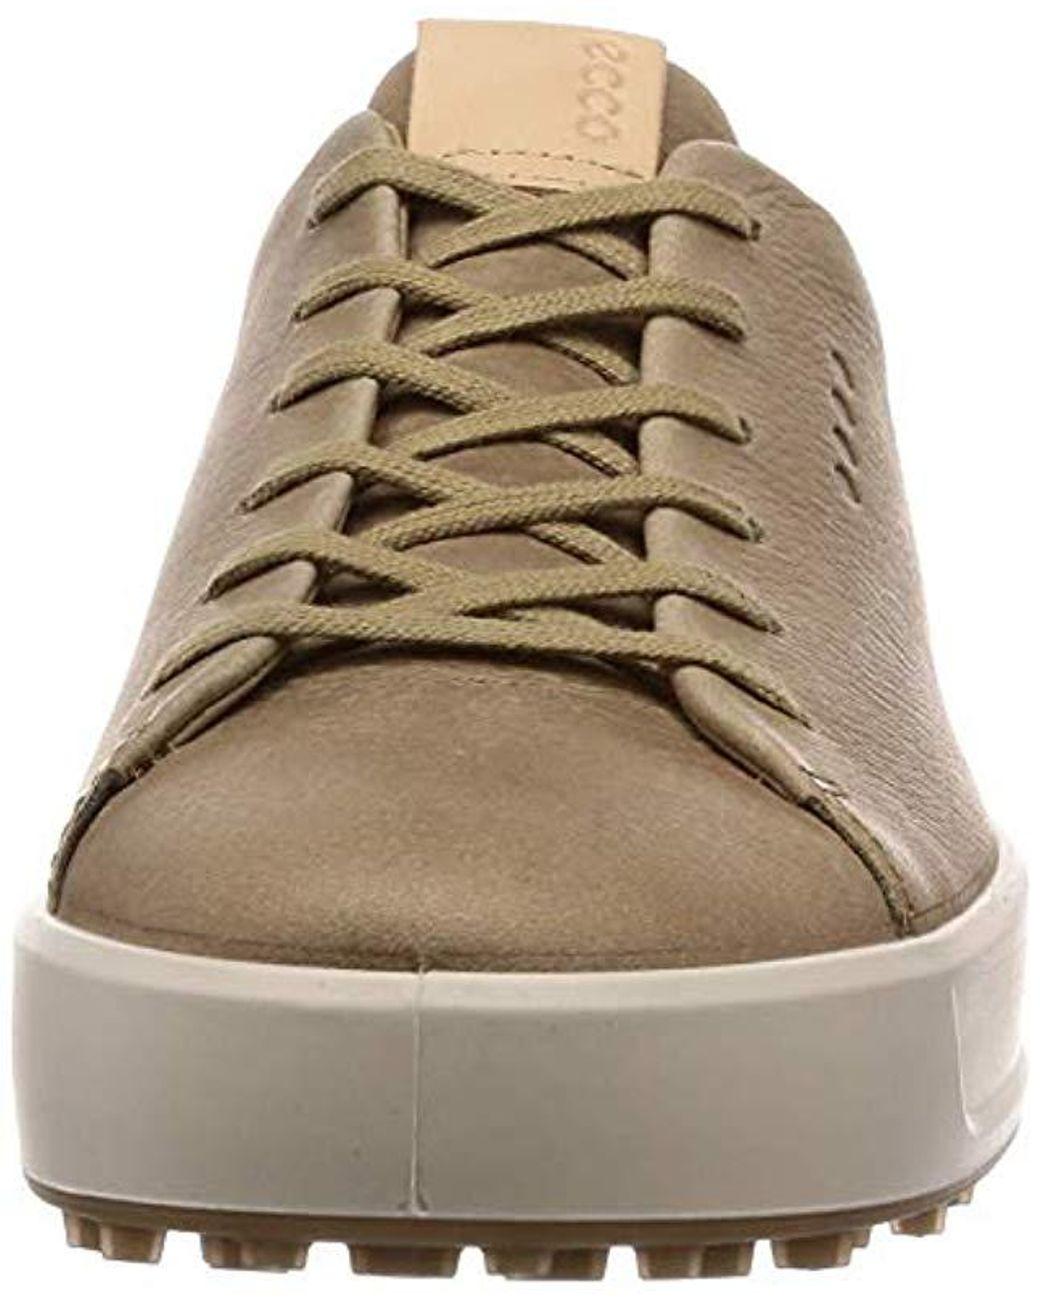 98a6159205b4a Ecco Soft Hydromax Golf Shoe in Brown for Men - Lyst